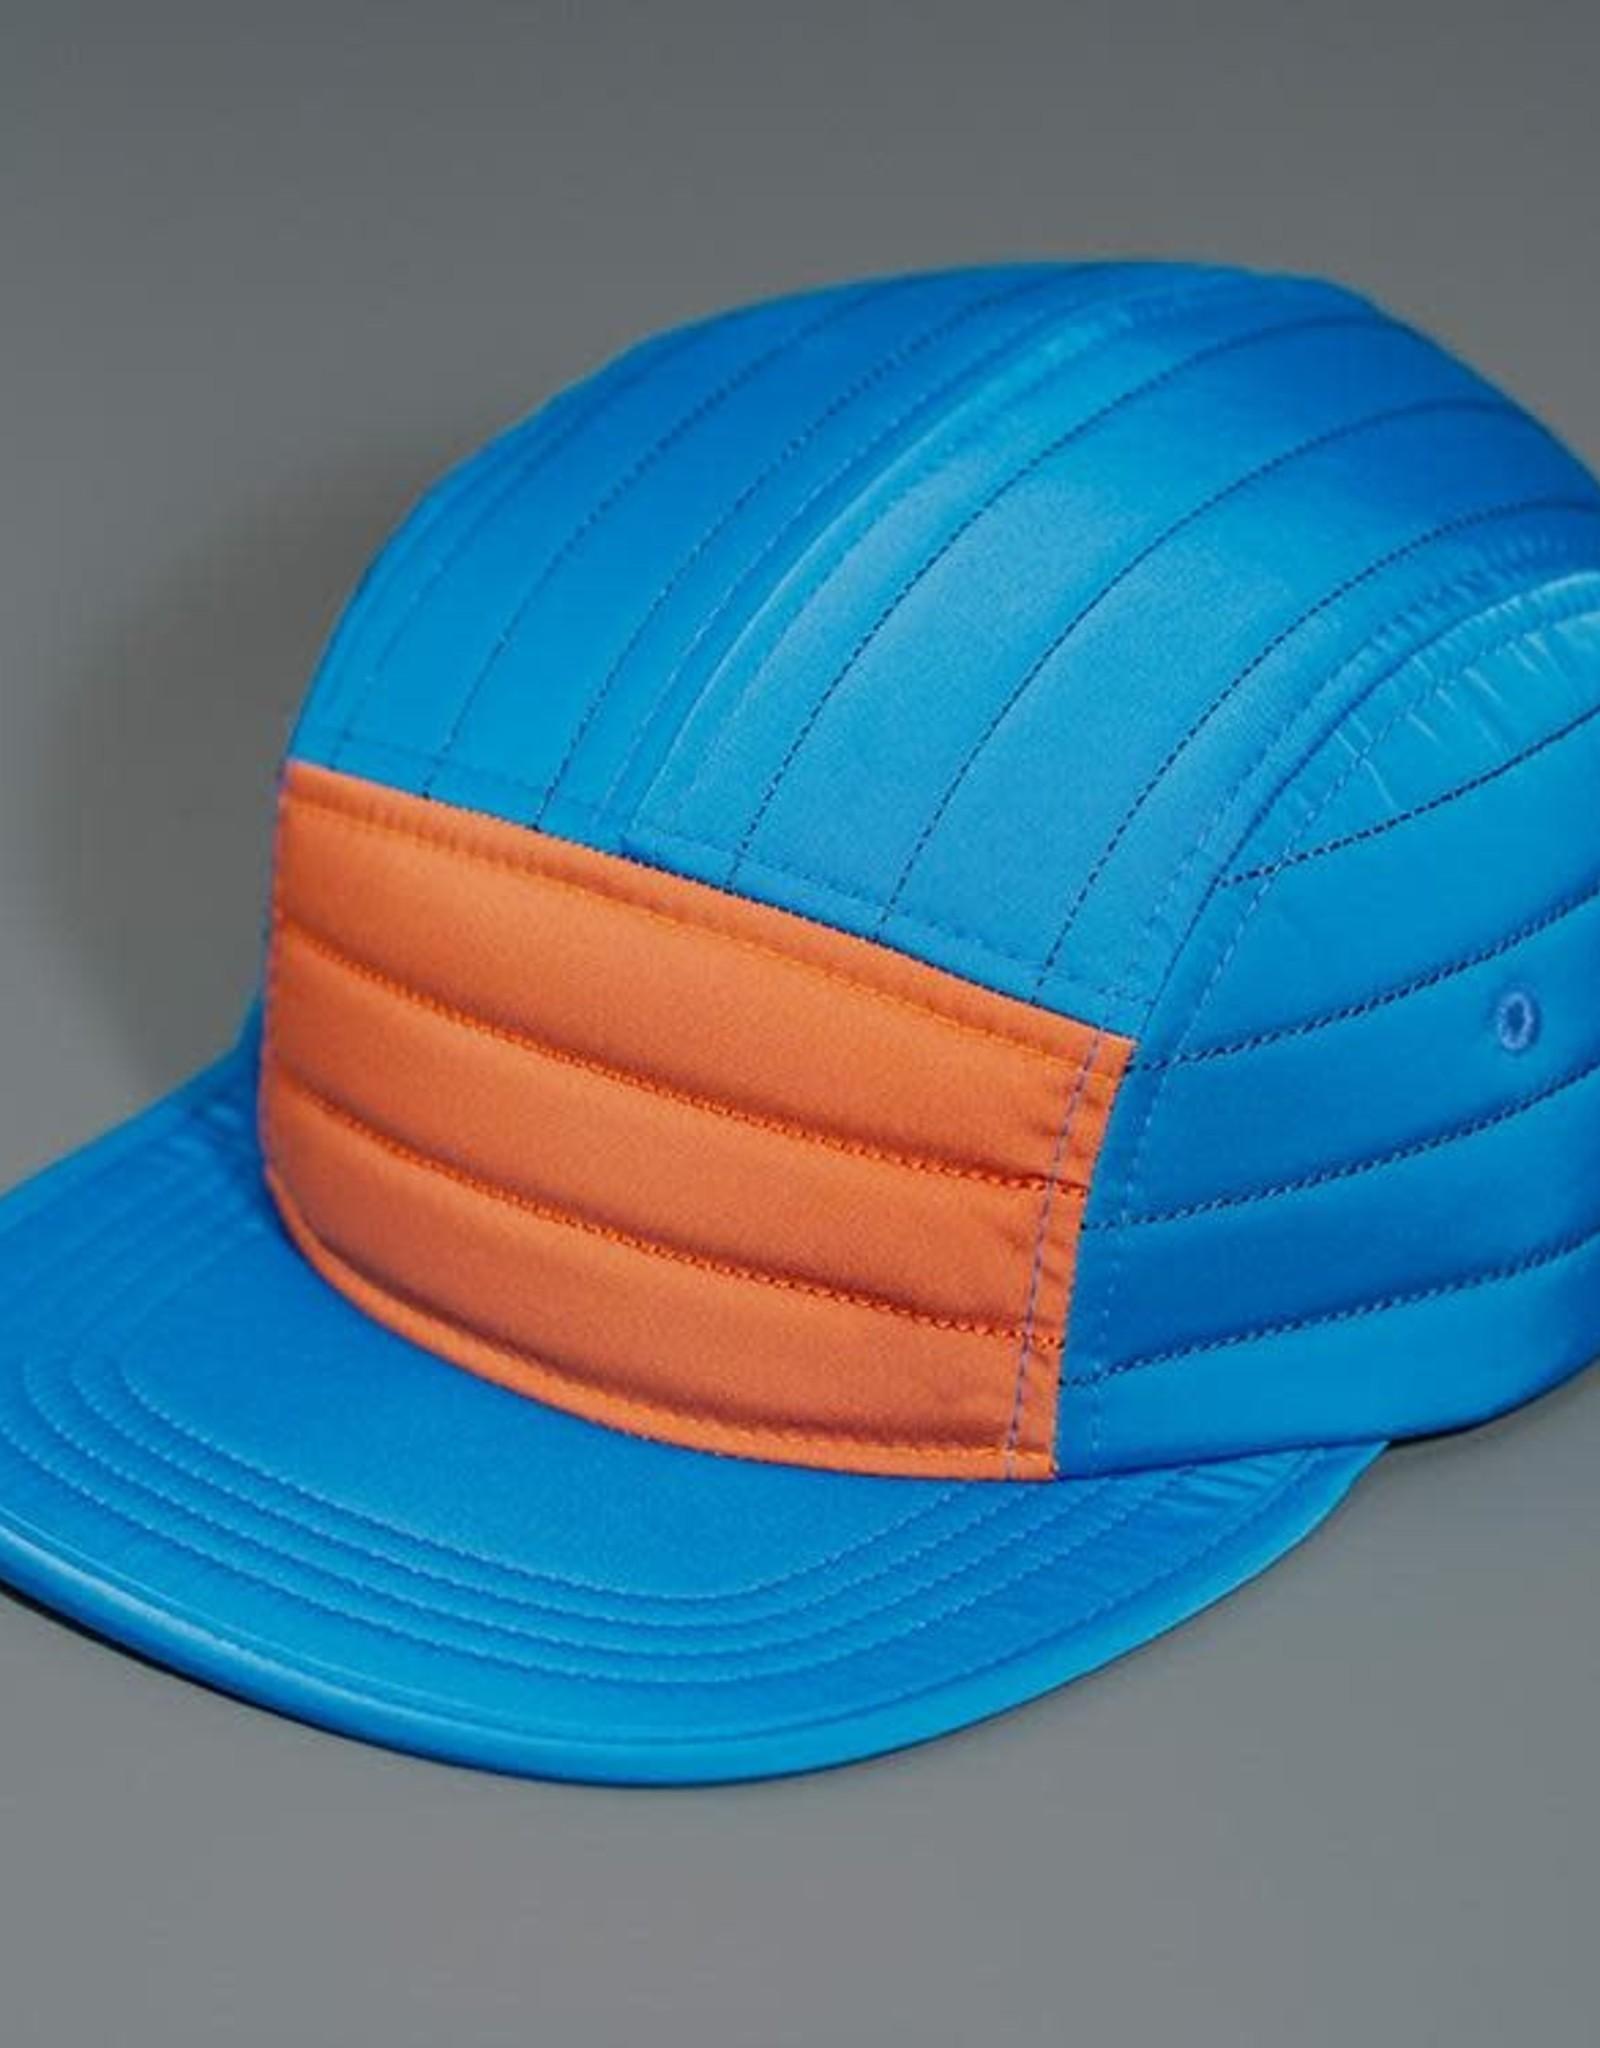 BLVNK BLVNK DAWN PATROL CAP  - OLD BLUE AND RUST